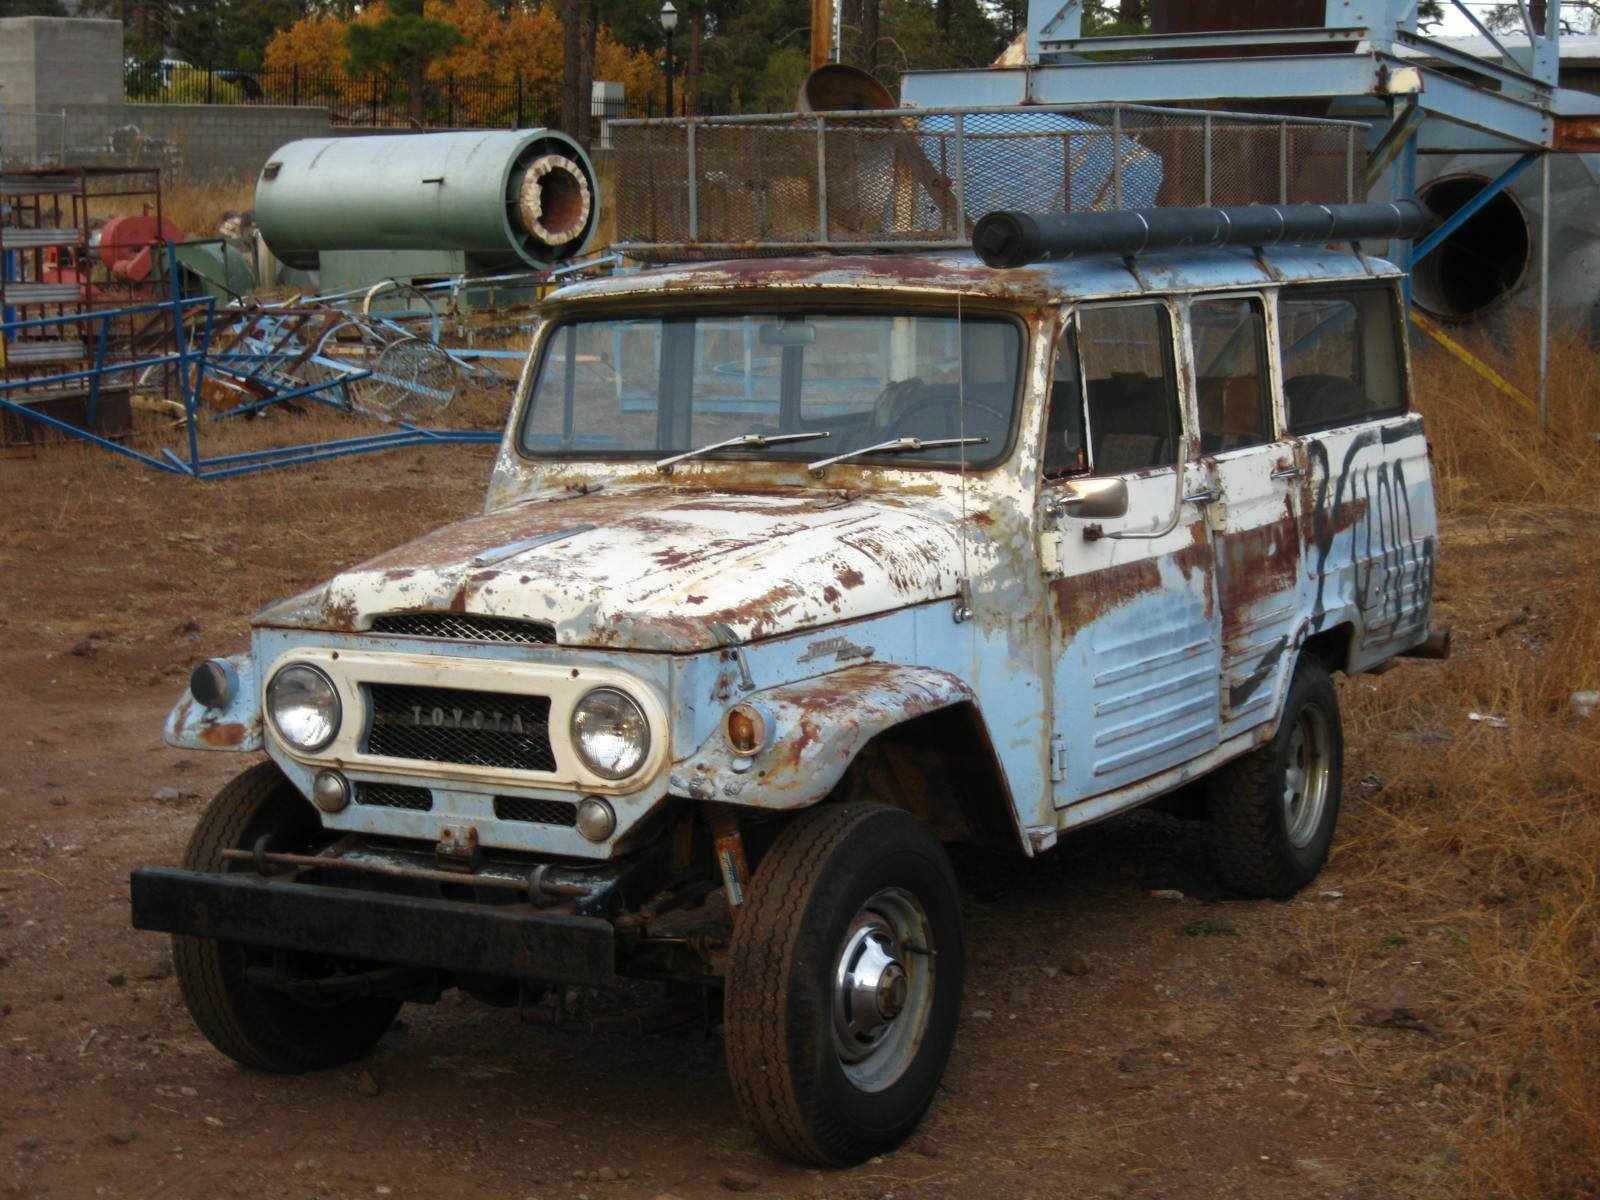 1966 TOYOTA LHD RARE 4 DR WAGON FJ45 LV BARN FIND!